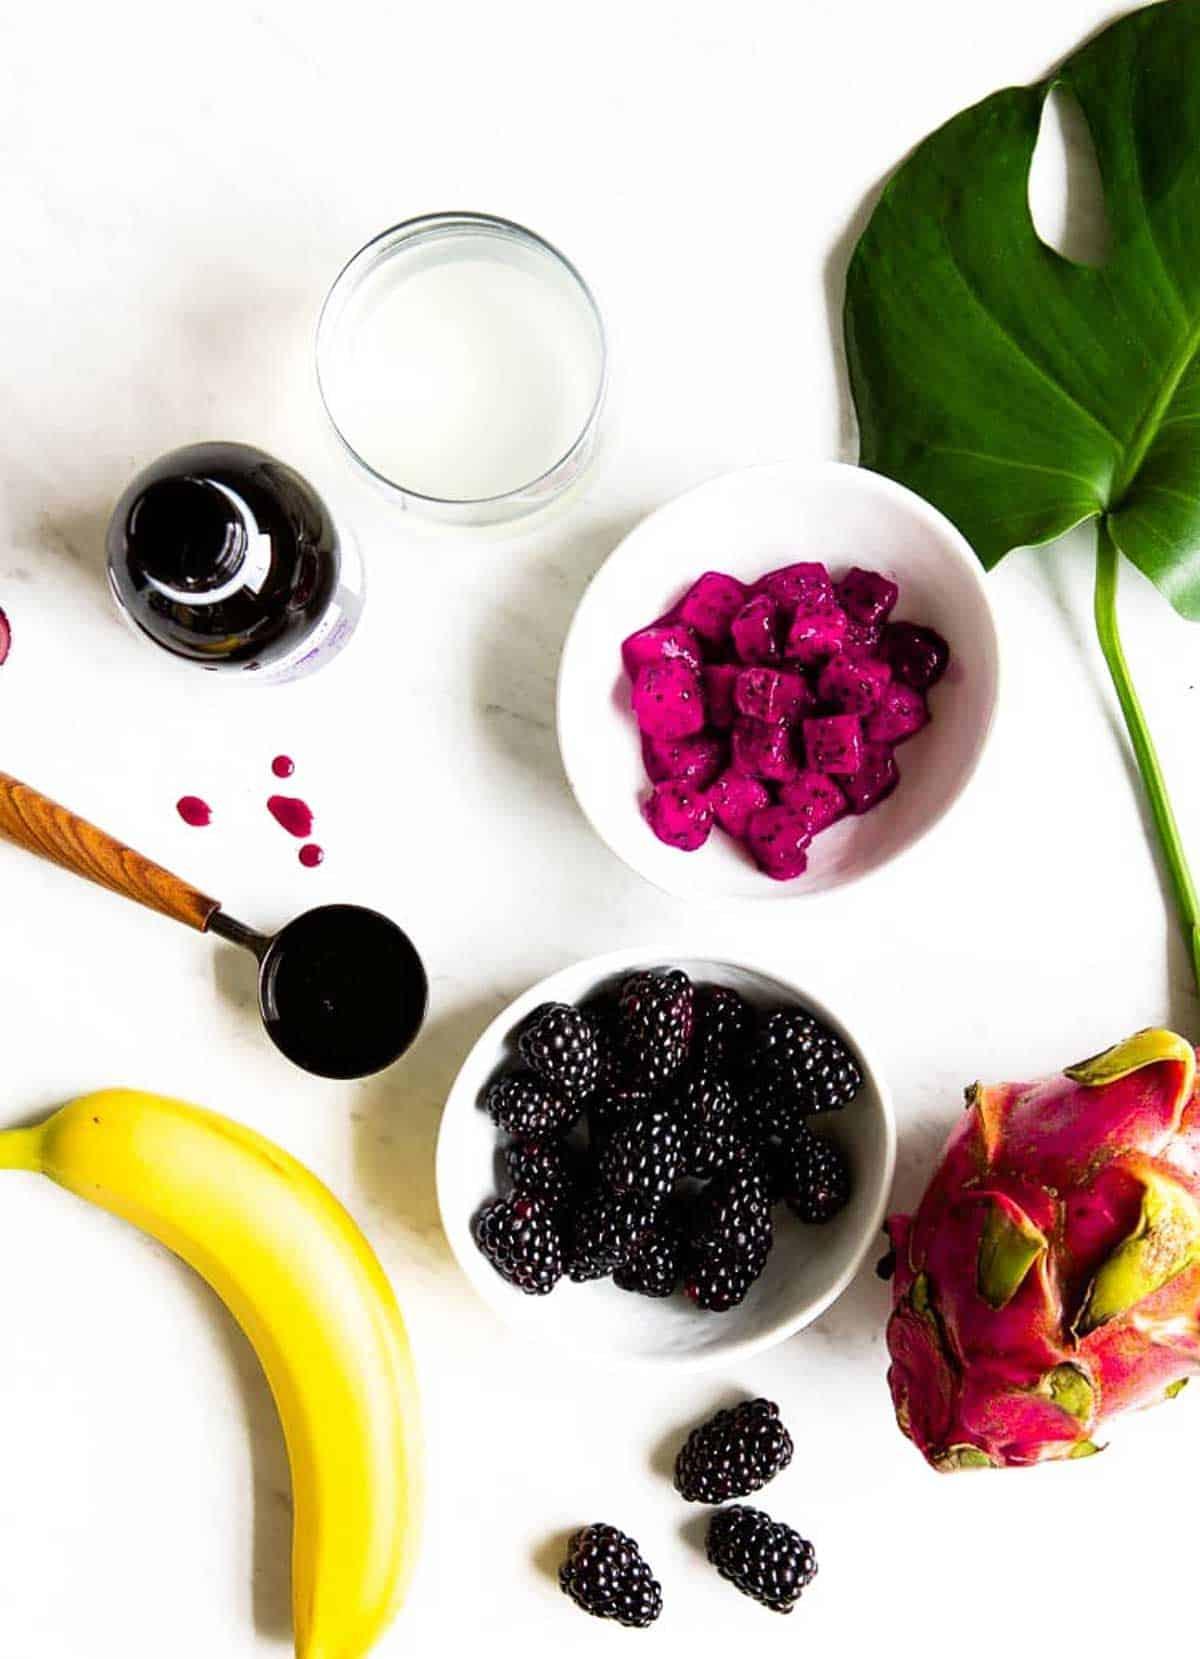 Ingredients in an elderberry smoothie